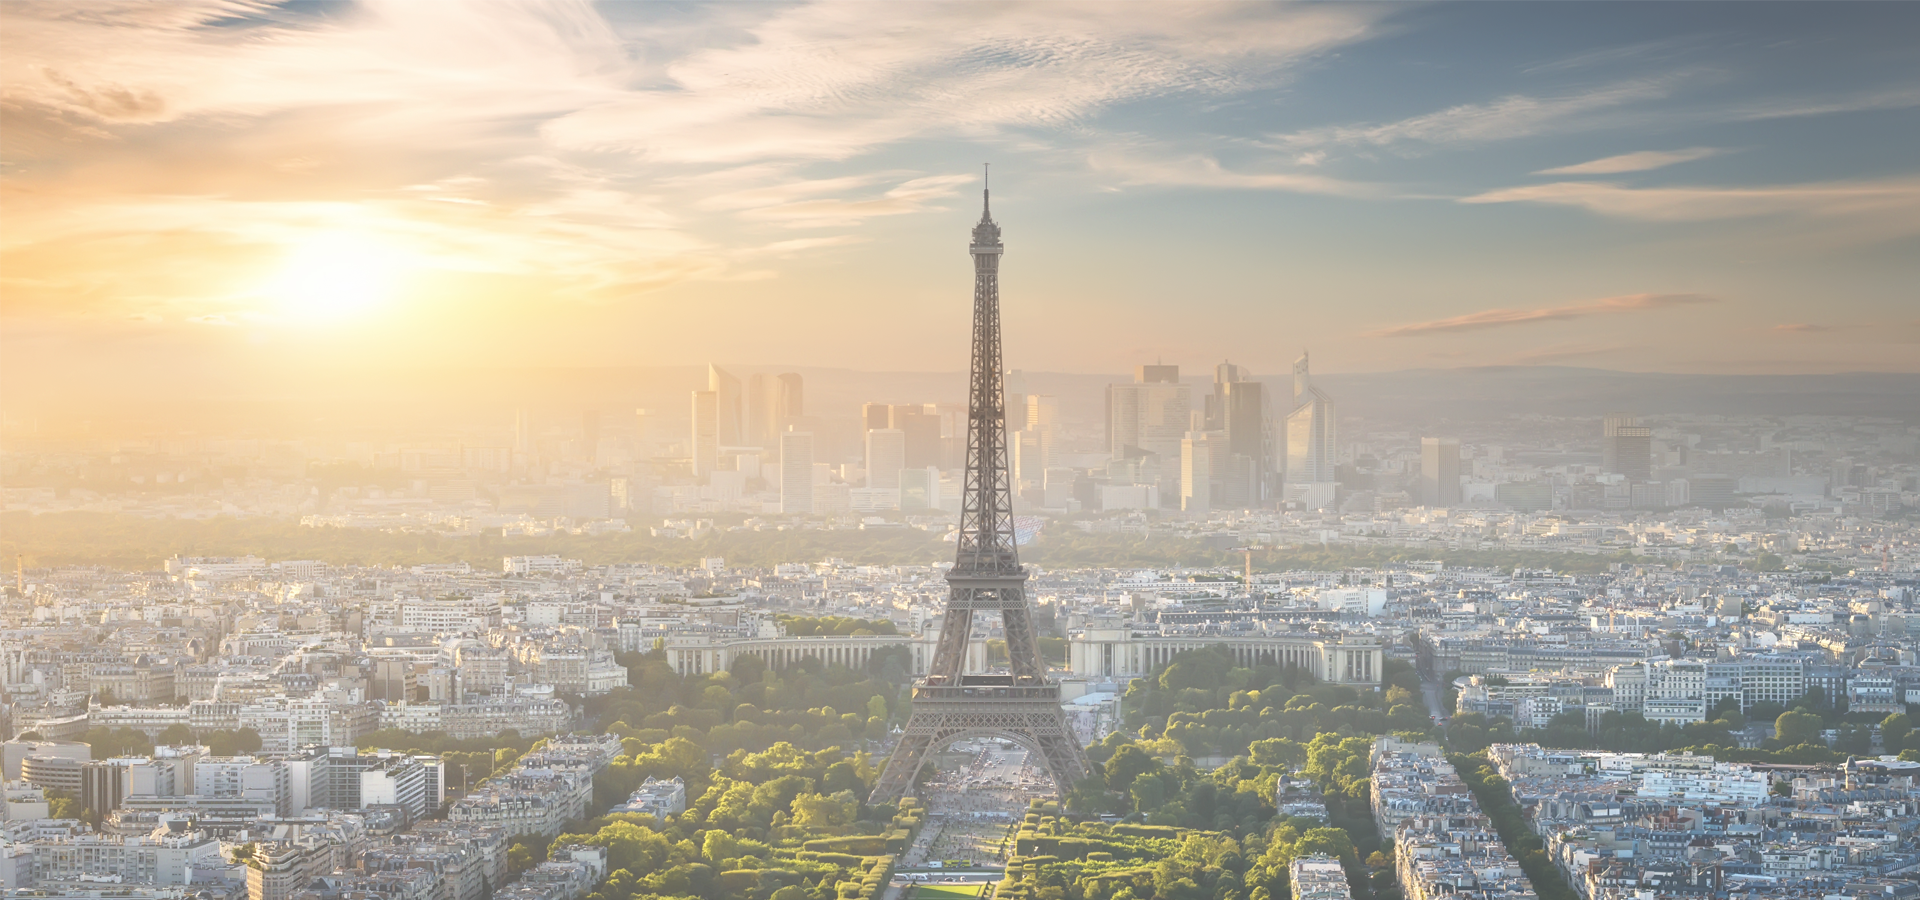 <b>Europe/Paris/Paris</b>